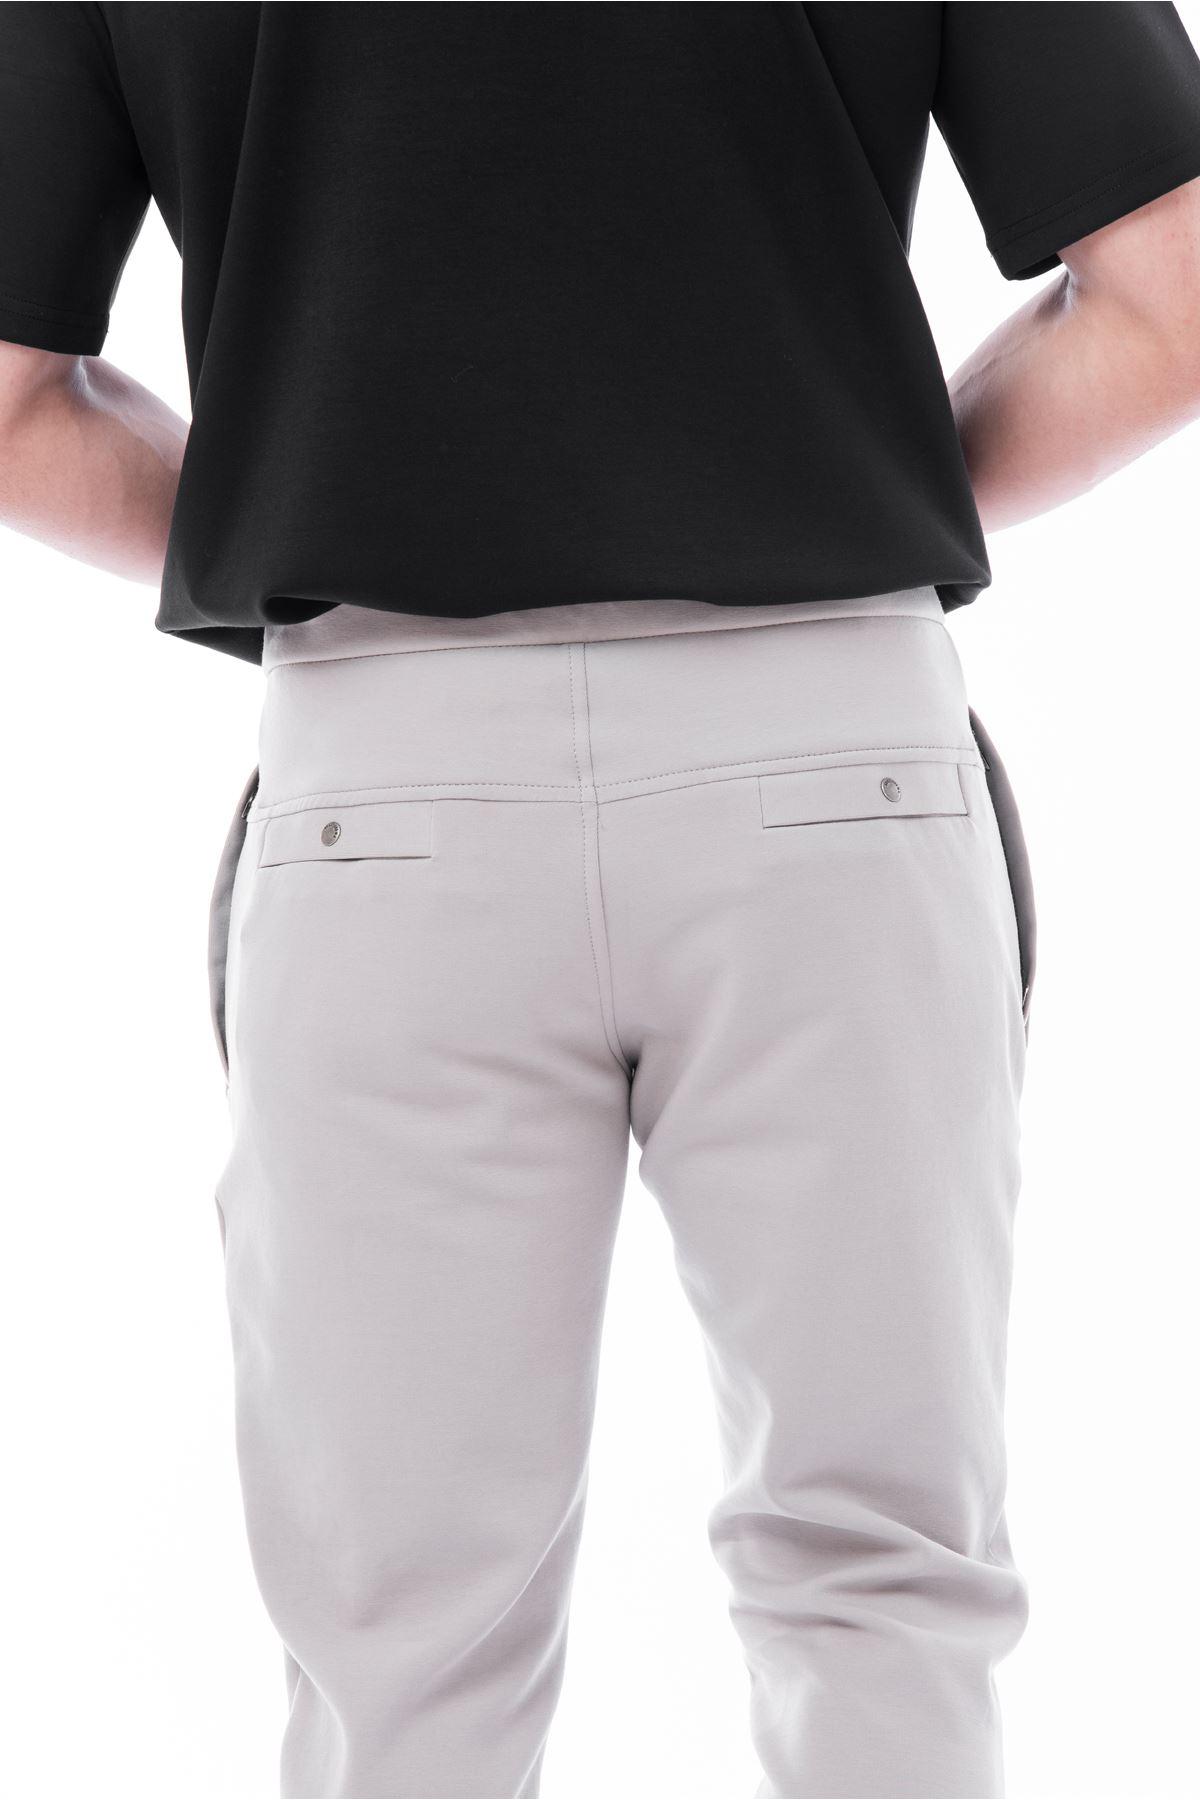 Gri Paça Lastikli Cepli Eşofman Altı Jogger Pantolon